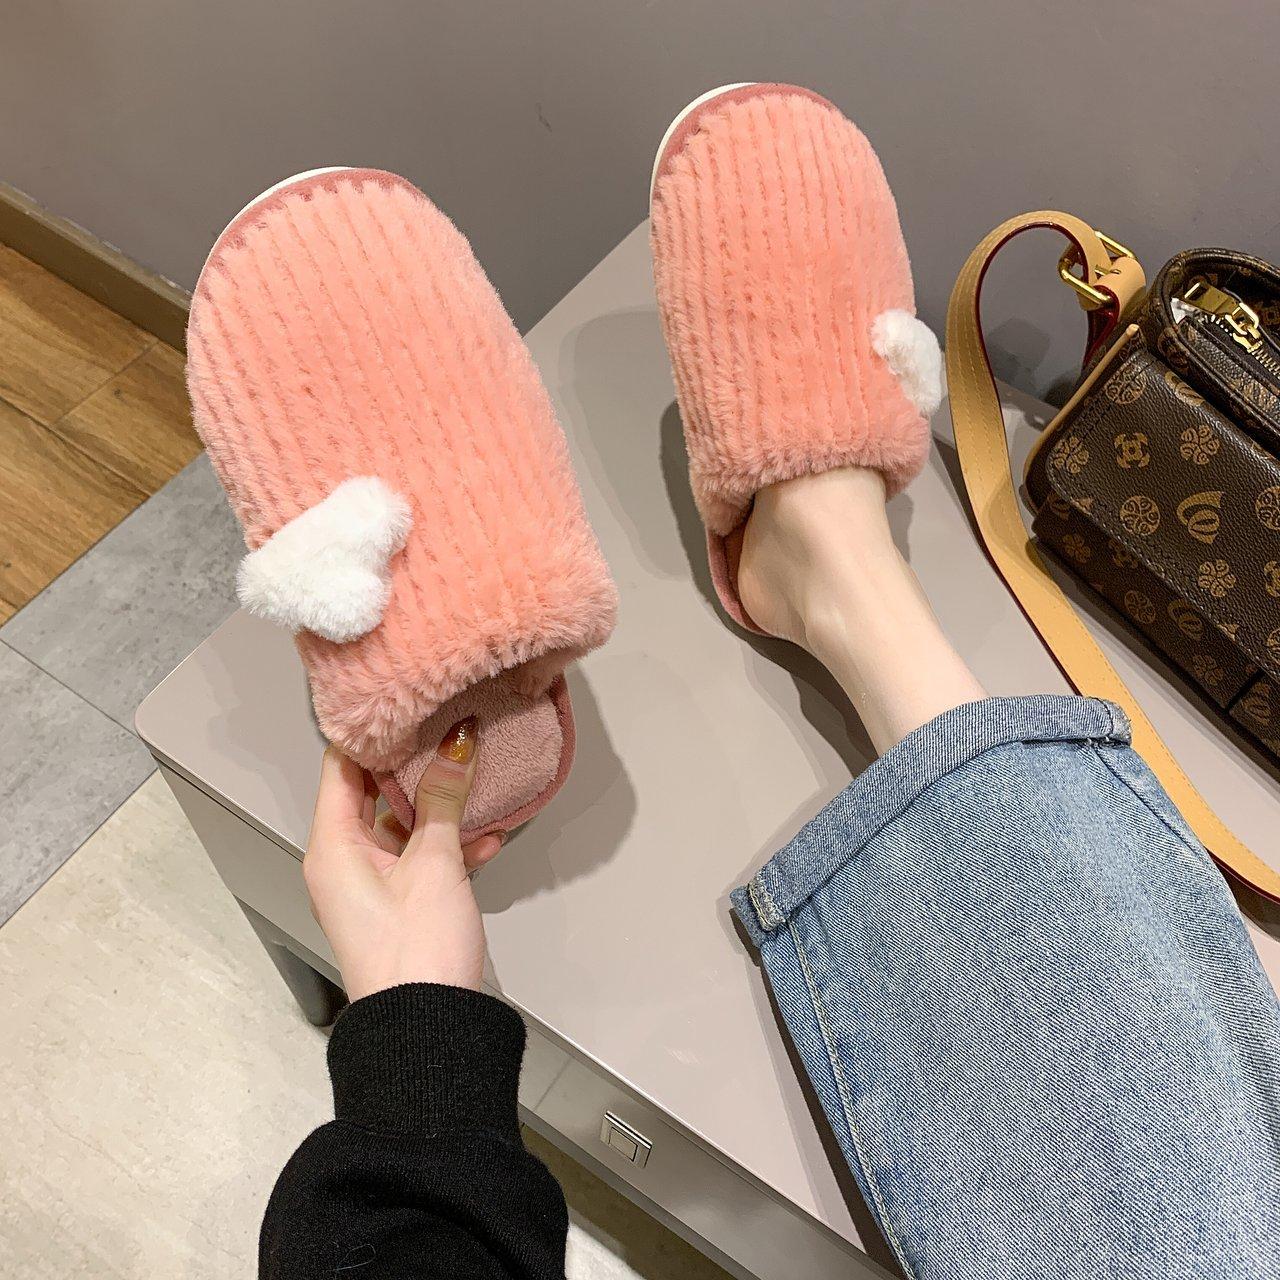 2020 Winter Warm Fur Slippers Women Men Boys Girls Slides House Shoes Flat Heel Home Soft Slipper In